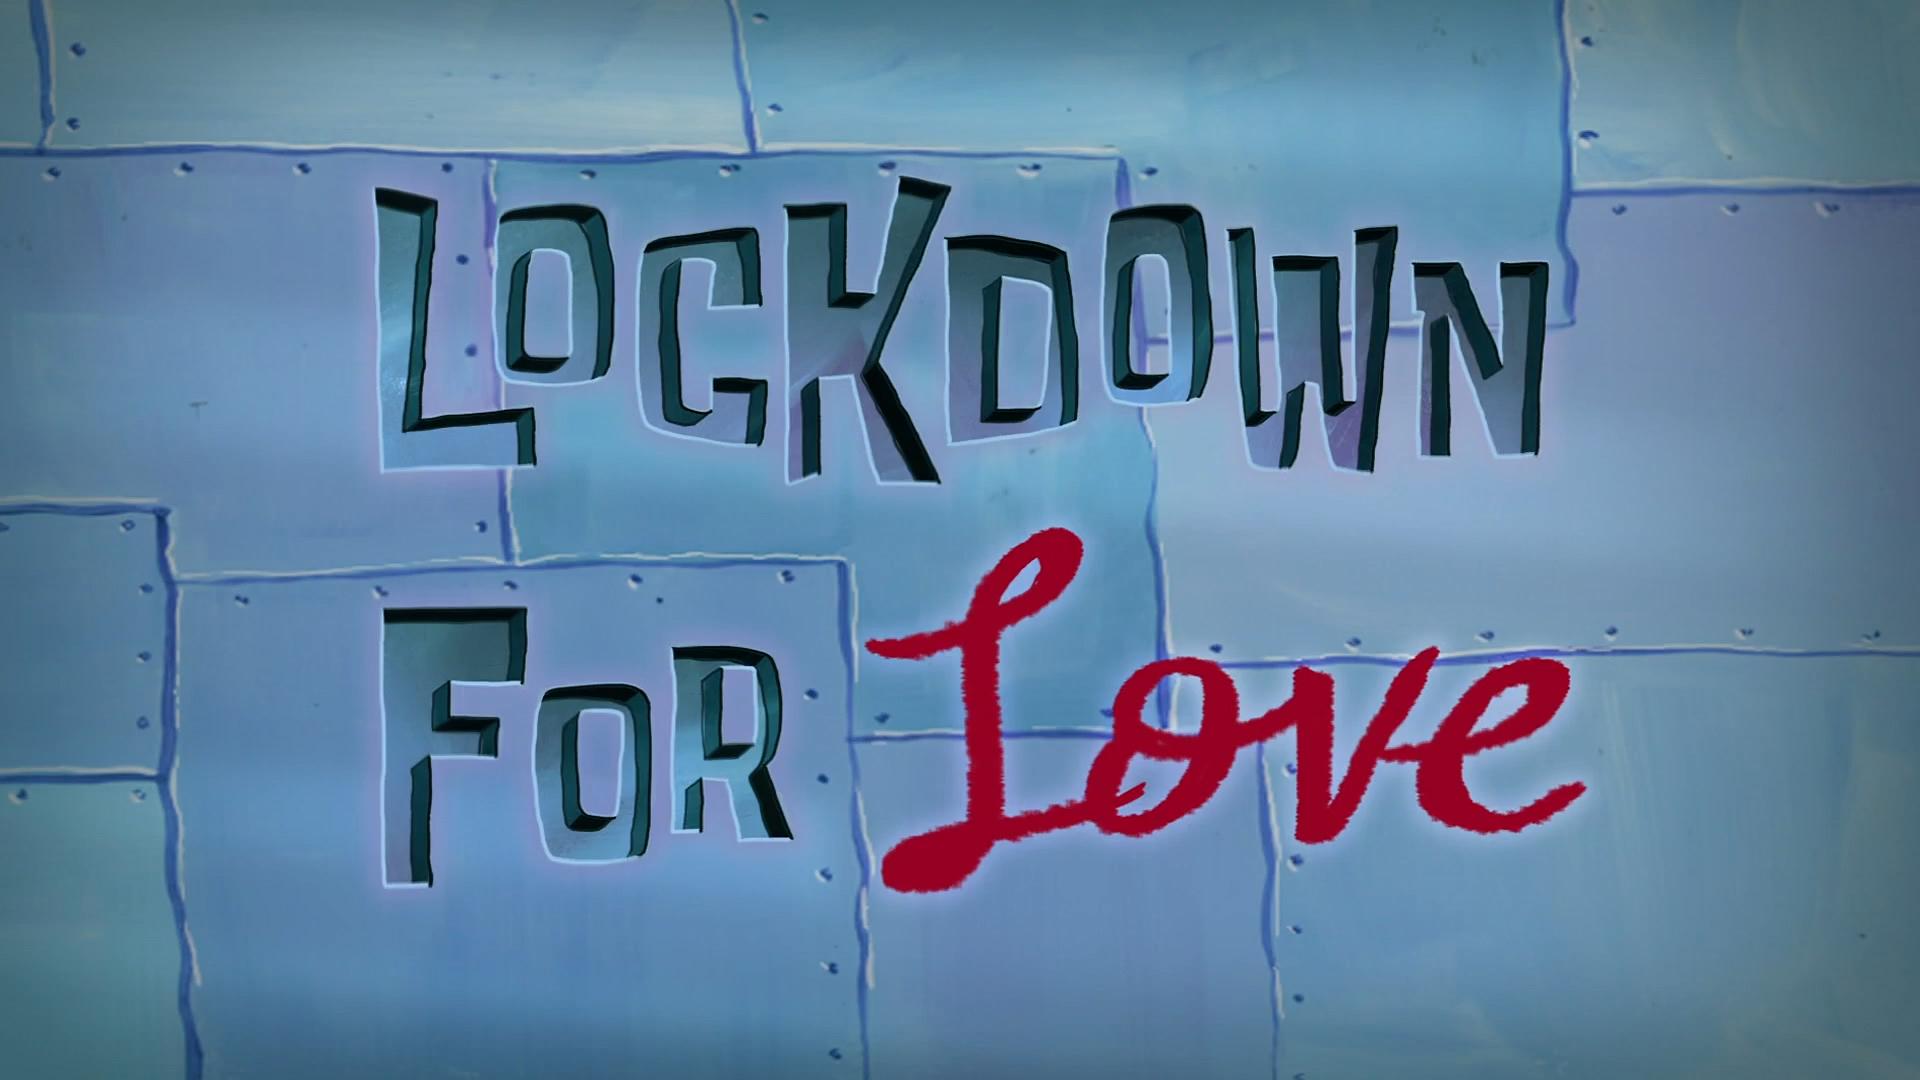 Lockdown for Love